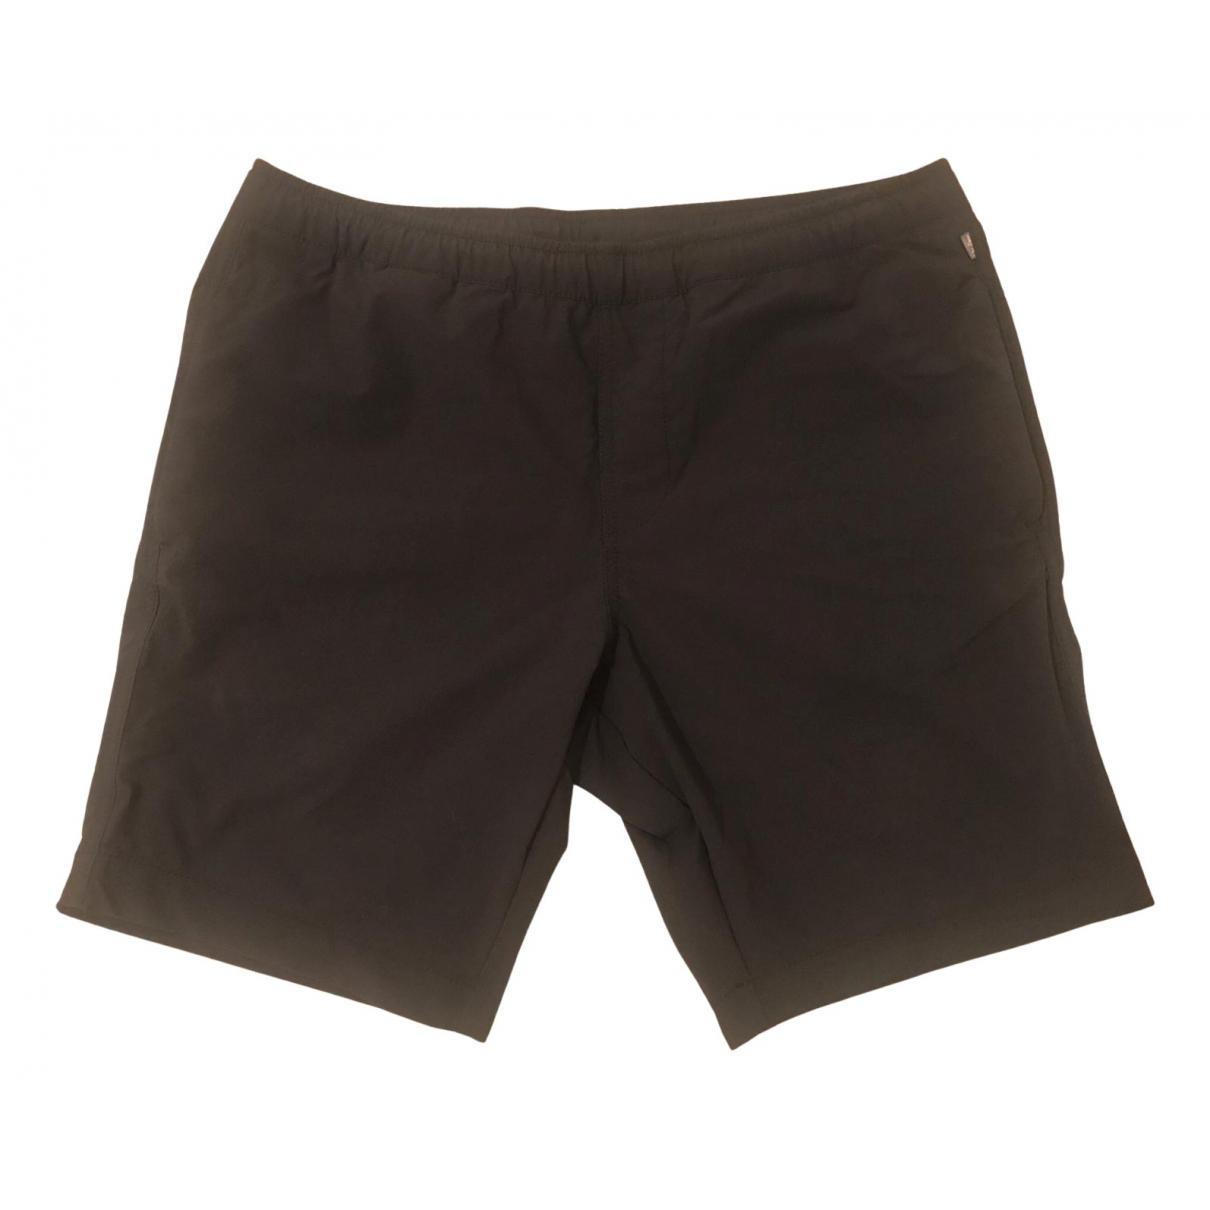 Napapijri \N Shorts in  Schwarz Synthetik